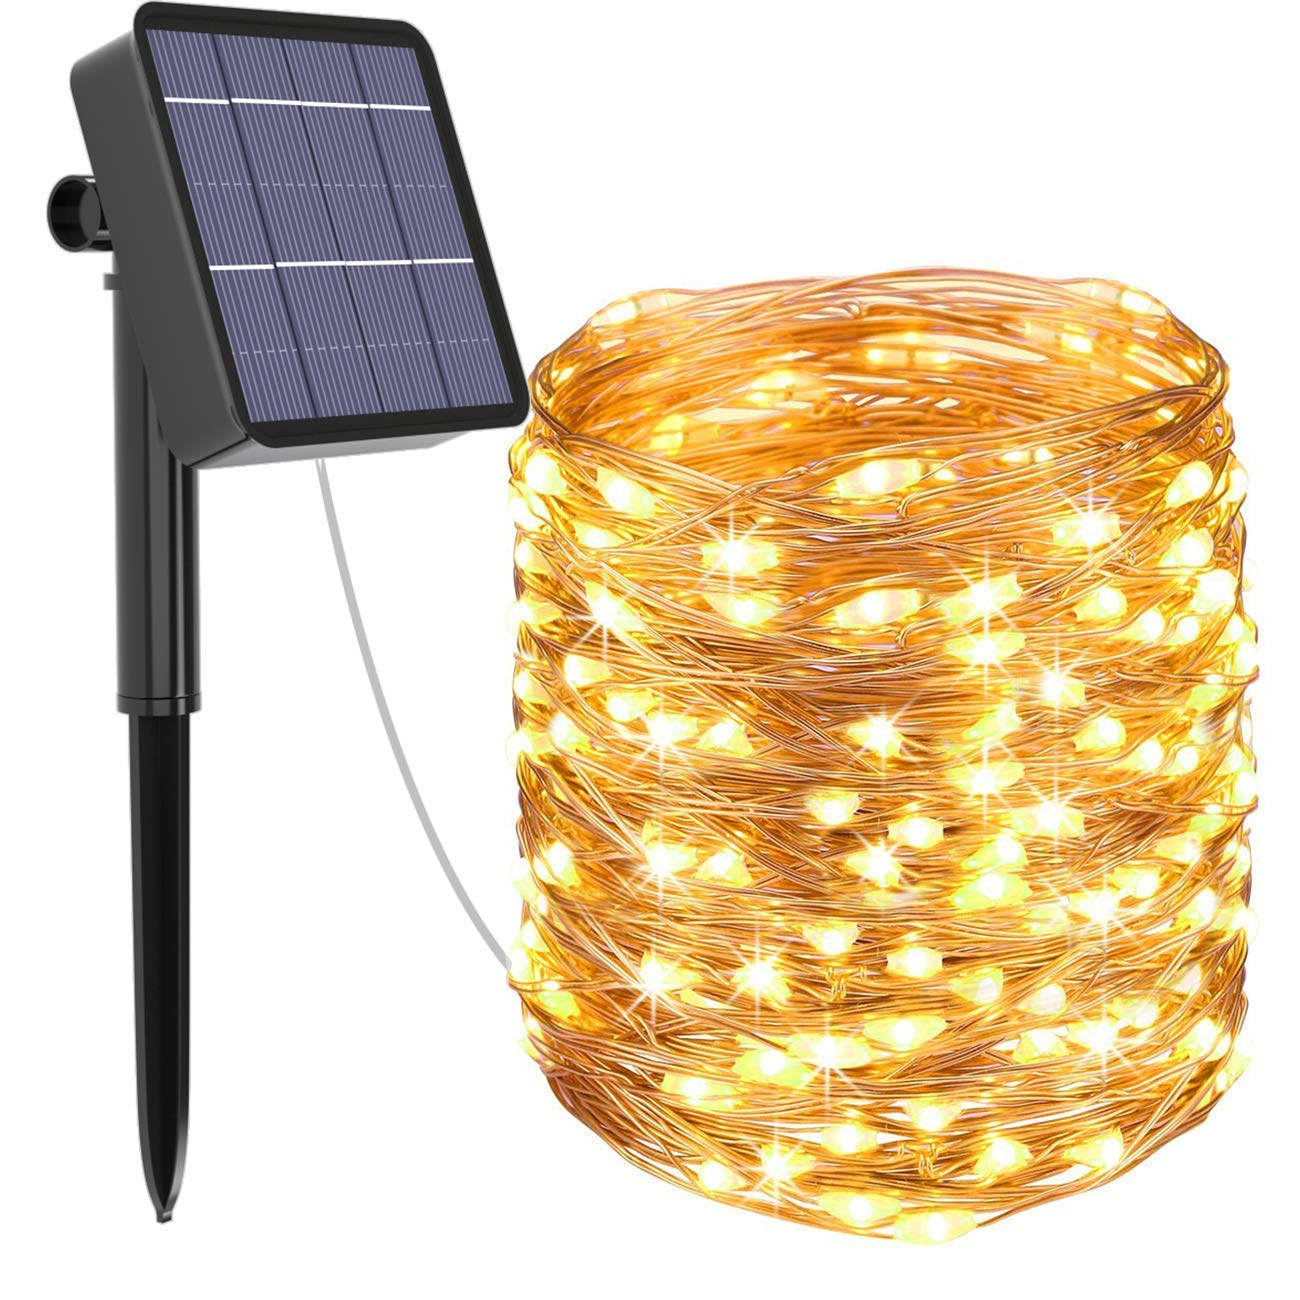 Solar String Lights Outdoor, Kolpop 78.7FT 240LED Solar Fairy Lights Outdoor Waterproof 8 Modes